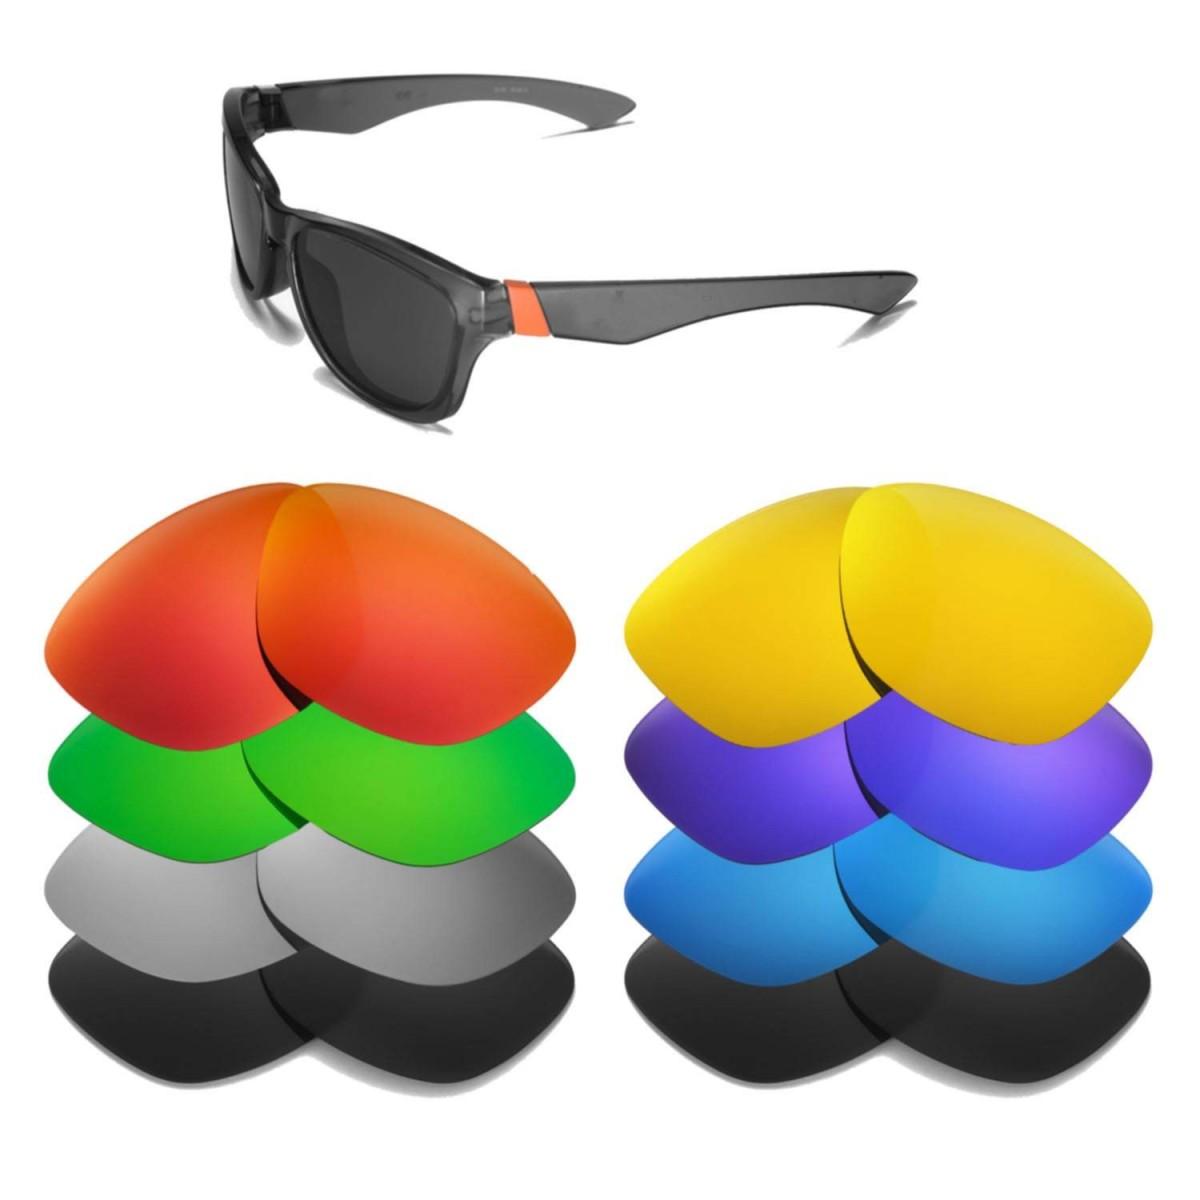 302308cc0b Cofery Lenses Store Cofery Replacement Lenses for Oakley Jupiter Sunglasses